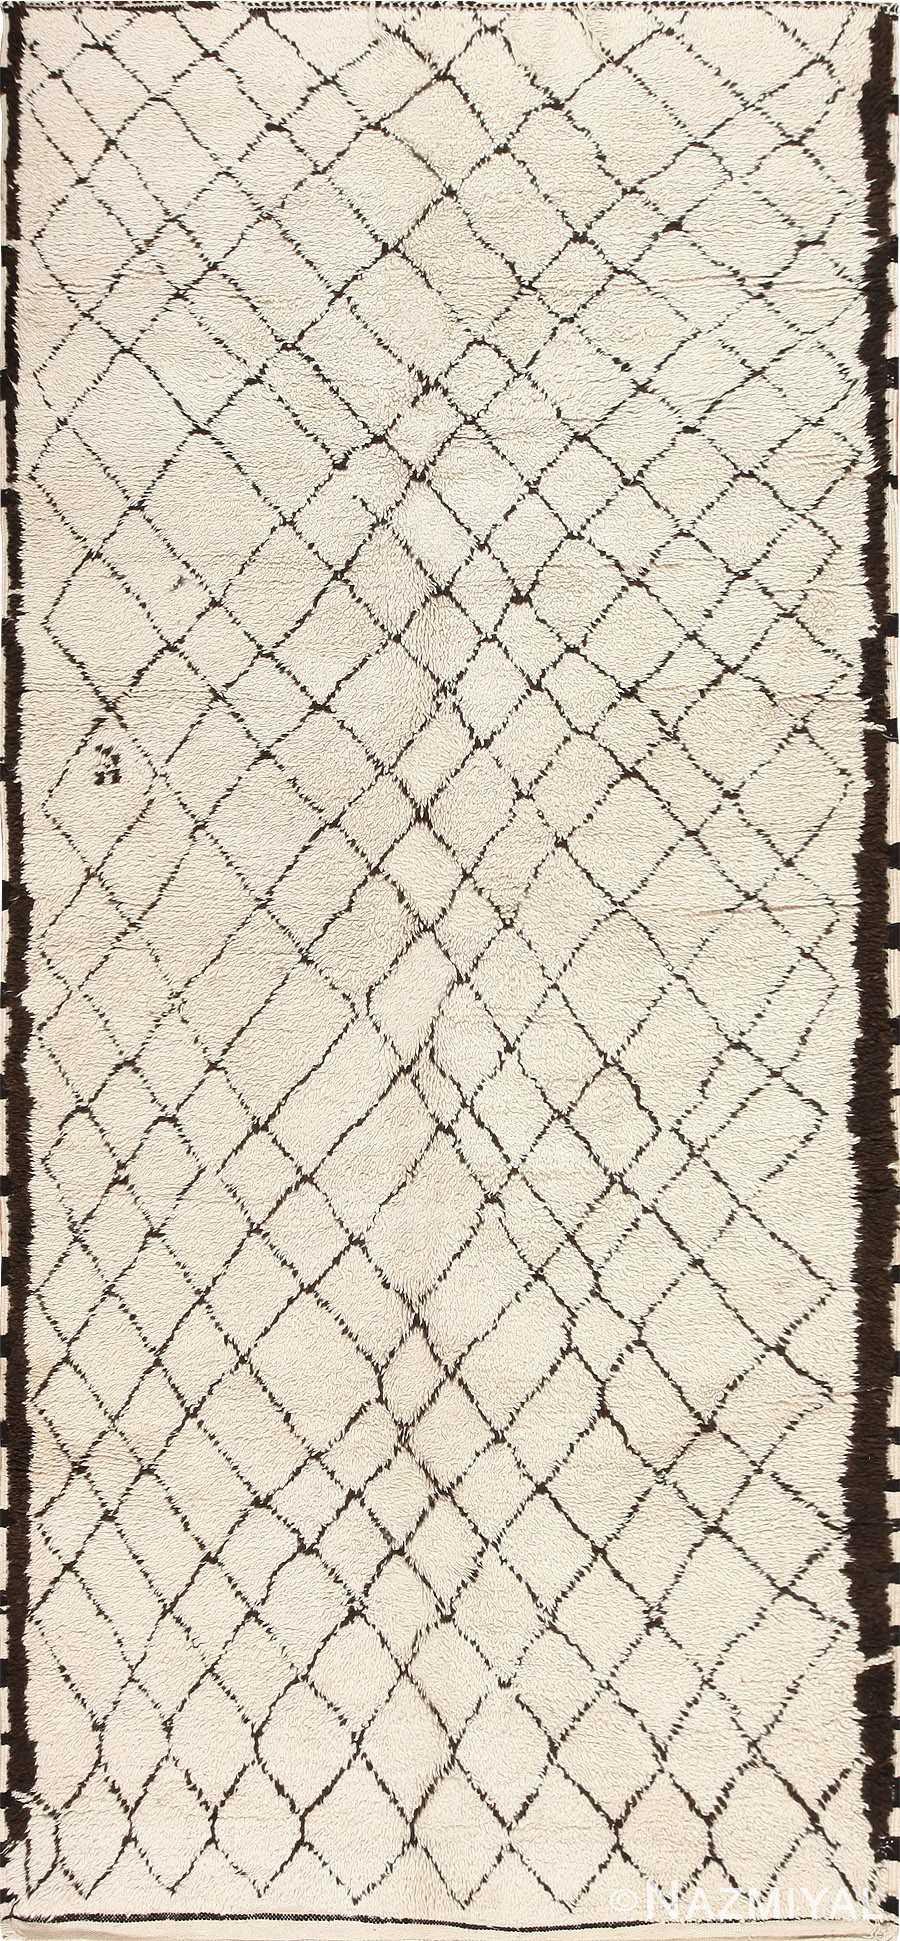 Vintage Moroccan Carpet 47934 Detail/Large View